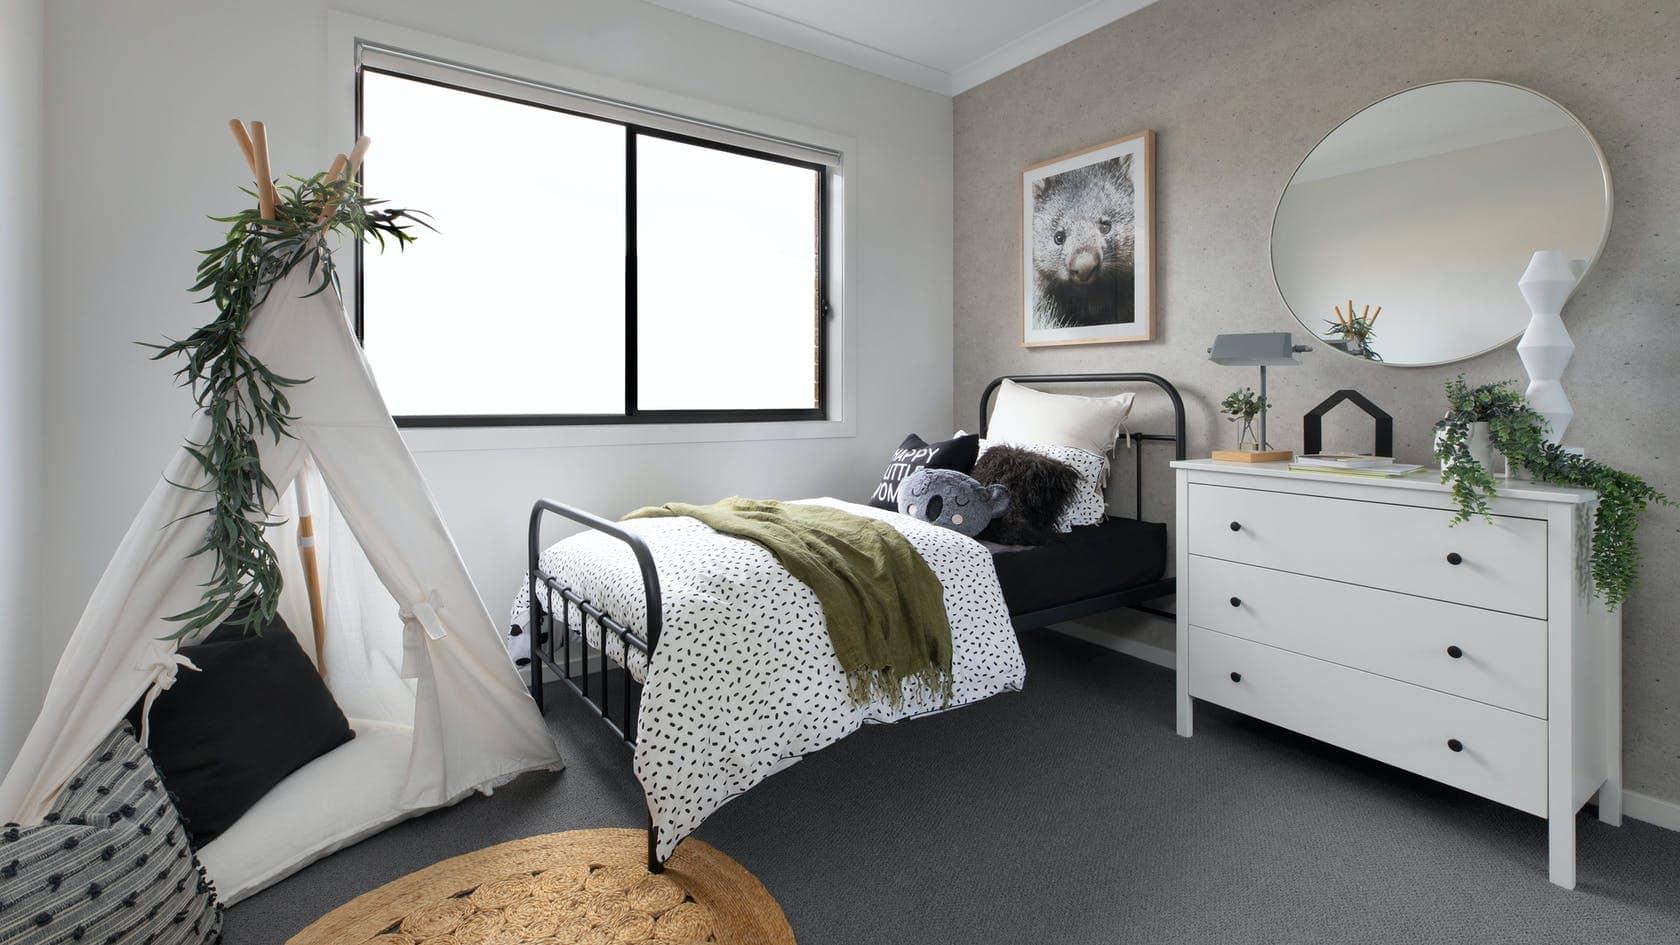 single black metal bed frame styled in kids bedroom with koala cushion